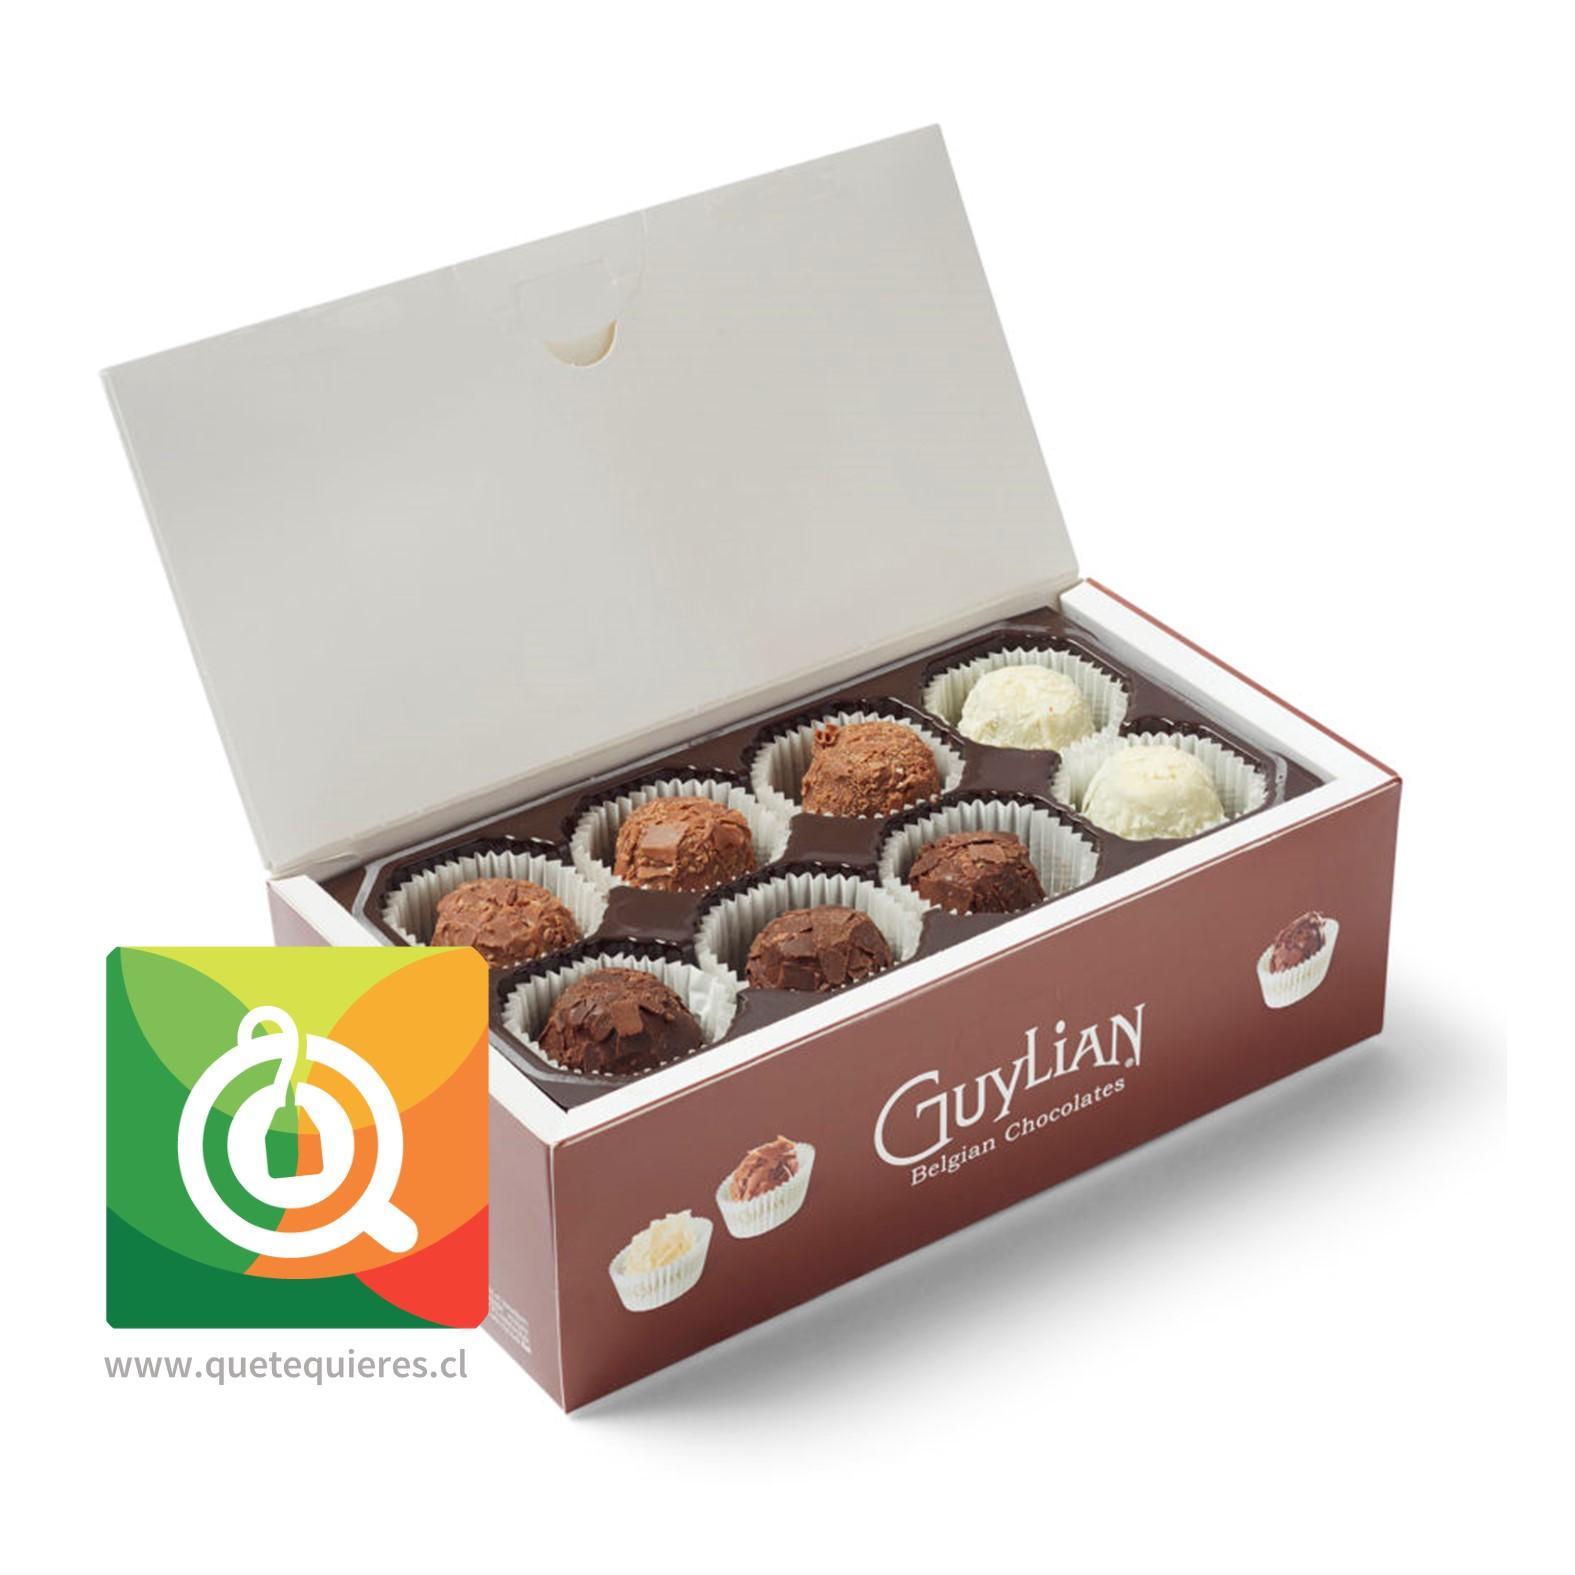 Guylian Bombon Chocolate Trufflina- Image 2